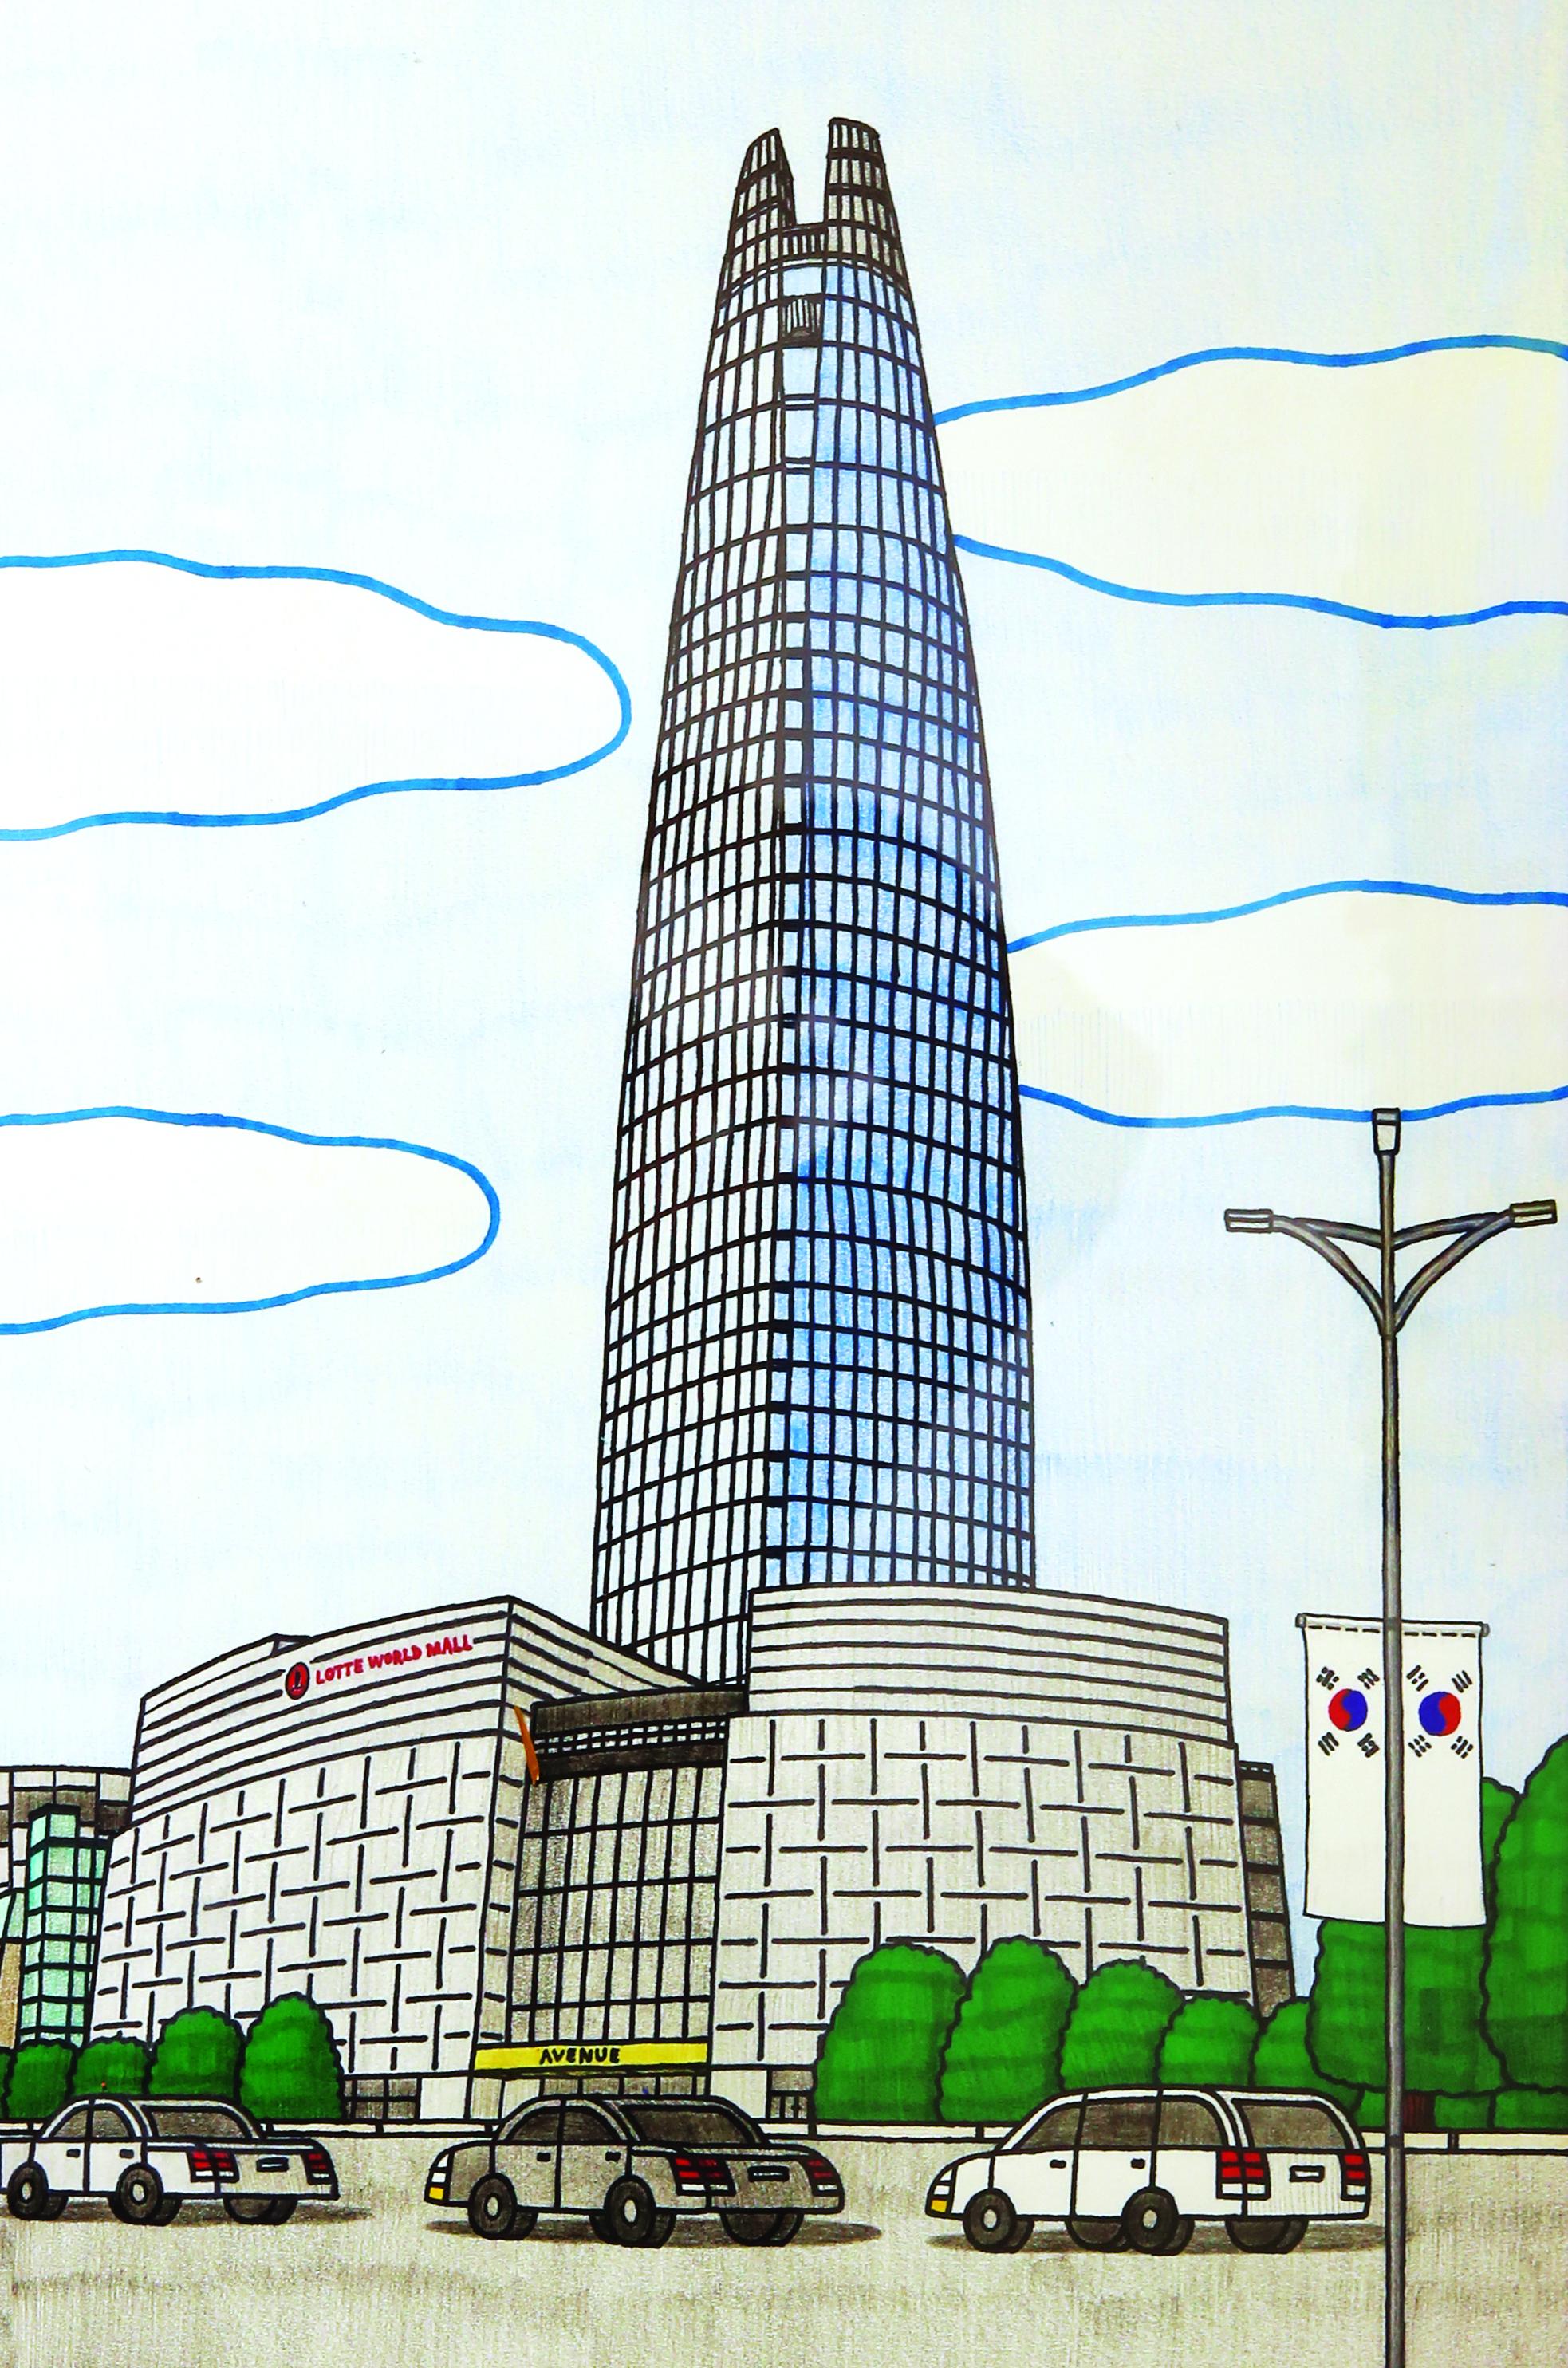 Lotte World Tower, 39.3x54.5cm, 종이에 색연필, 2018